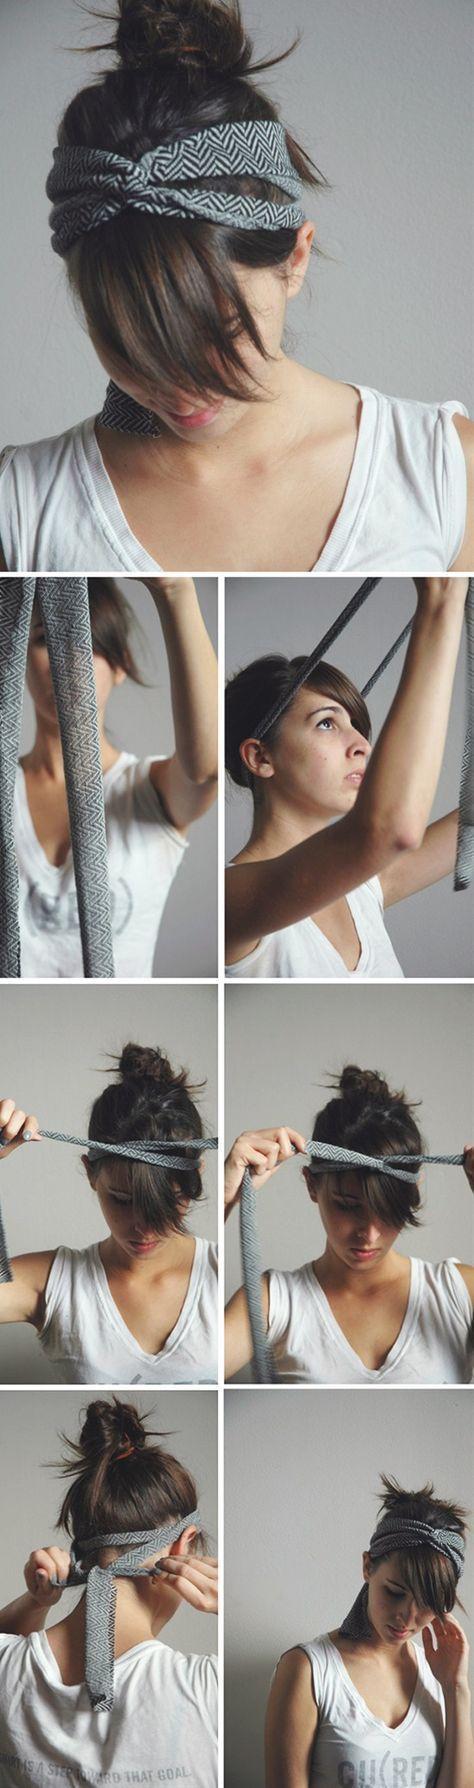 Best How To Wear A Bandana Short Hair Scarf Headbands 29 Ideas Howto